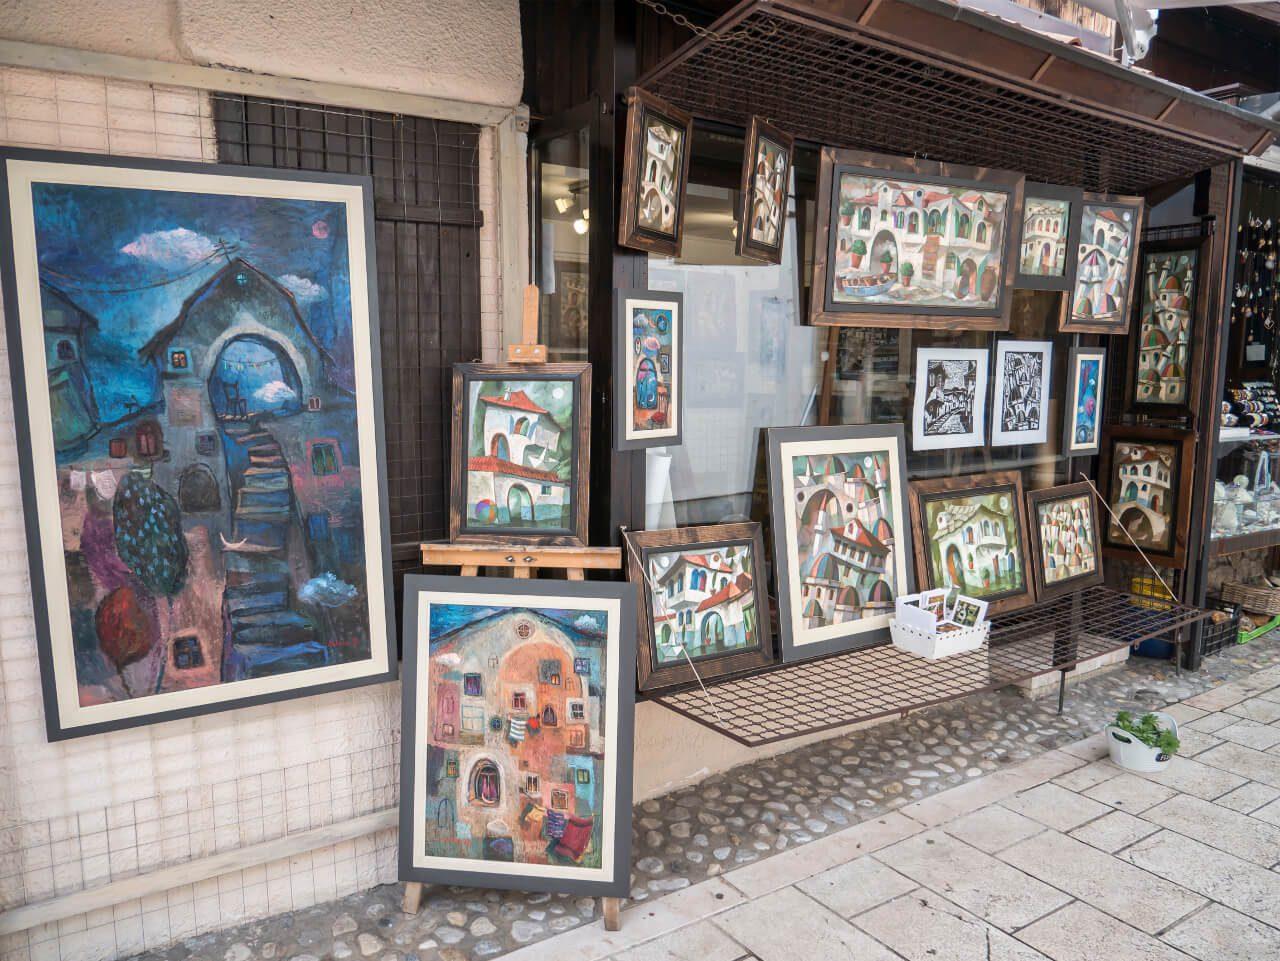 Sklep z pamiątkami (obrazy) na targu Baščaršija w Sarajewie